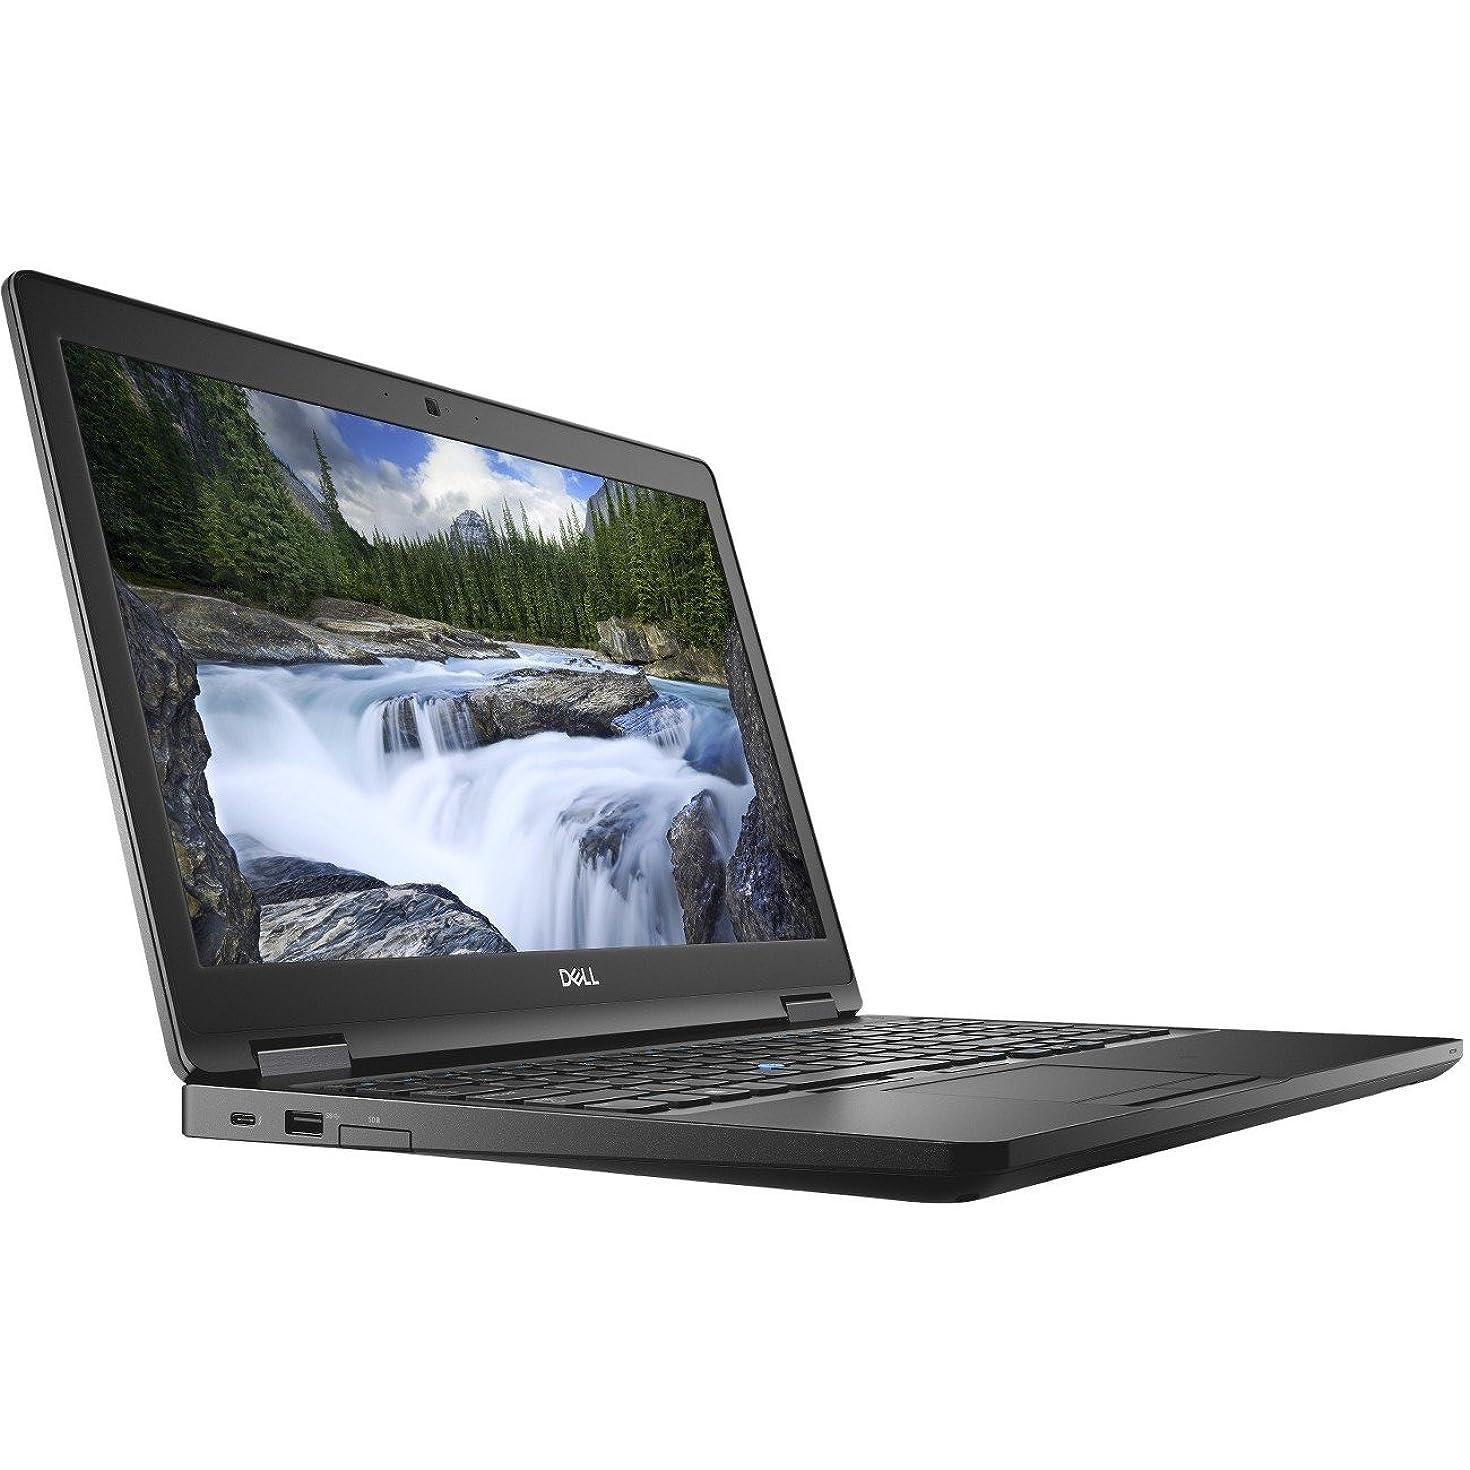 Dell 4KM6X Latitude 5490 Notebook with Intel i5-8350U, 8GB 256GB SSD, 14